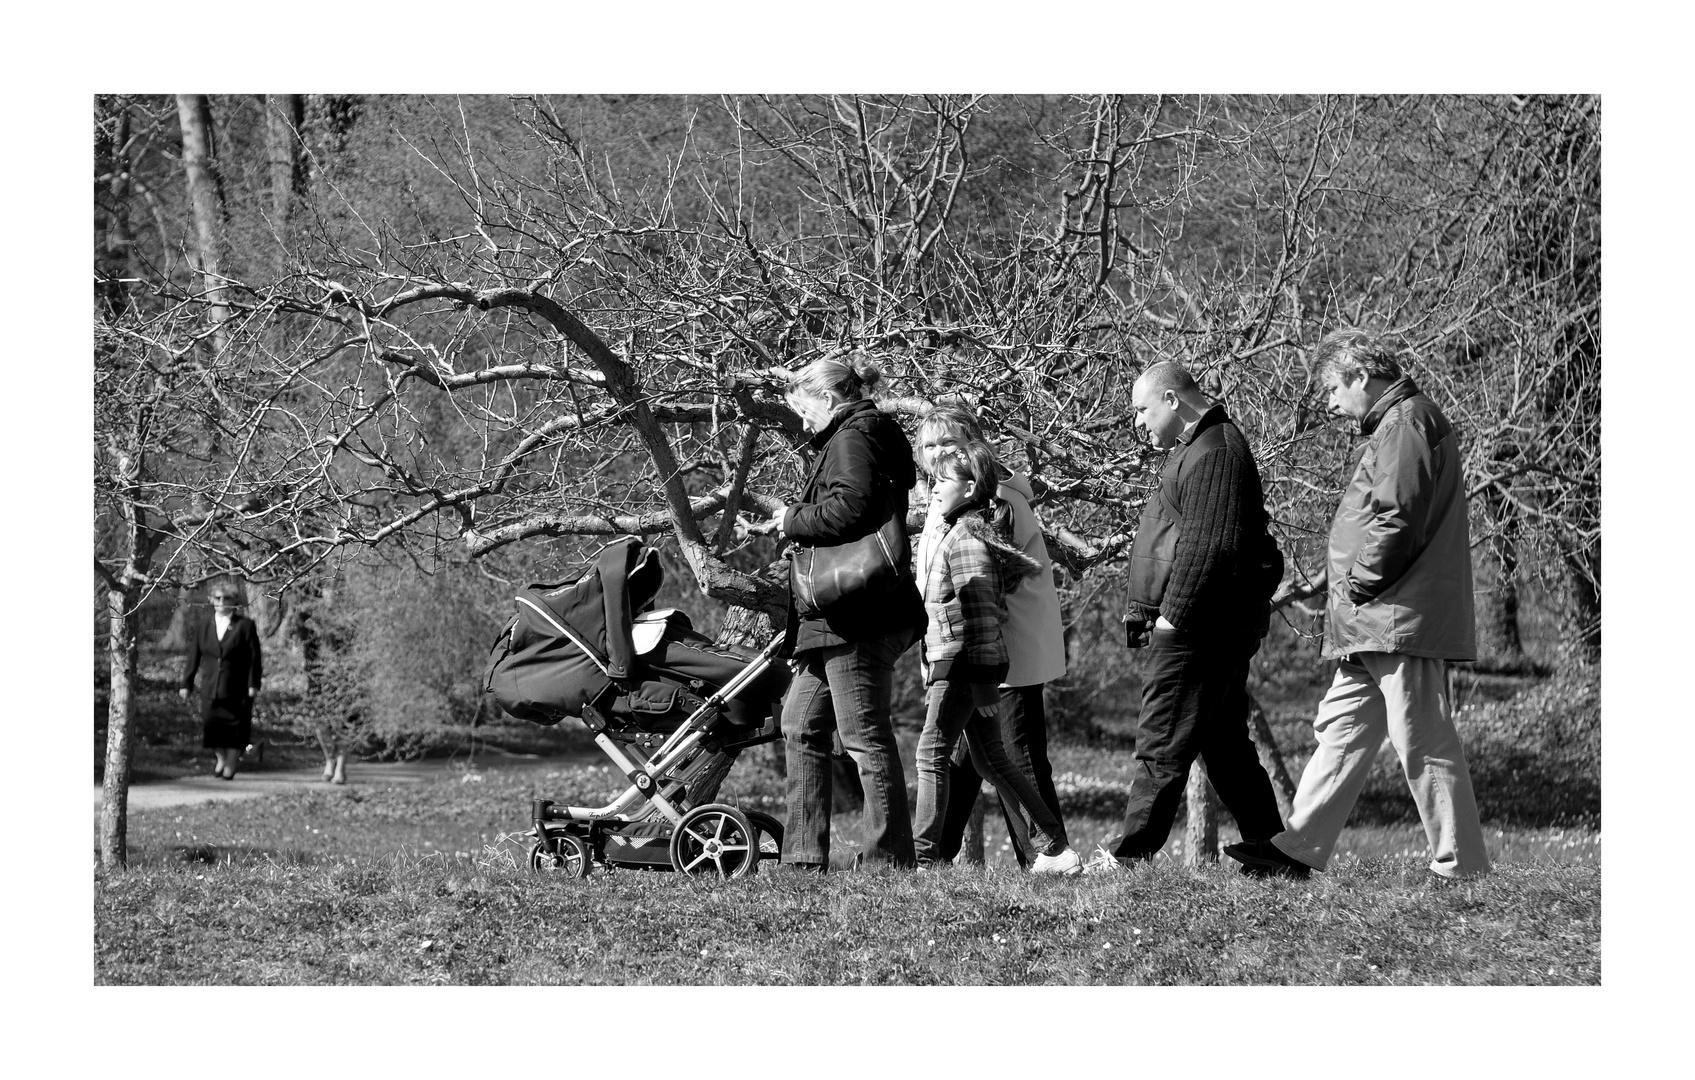 The Sunday-Afternoon-BigFamily-Generation-Walk